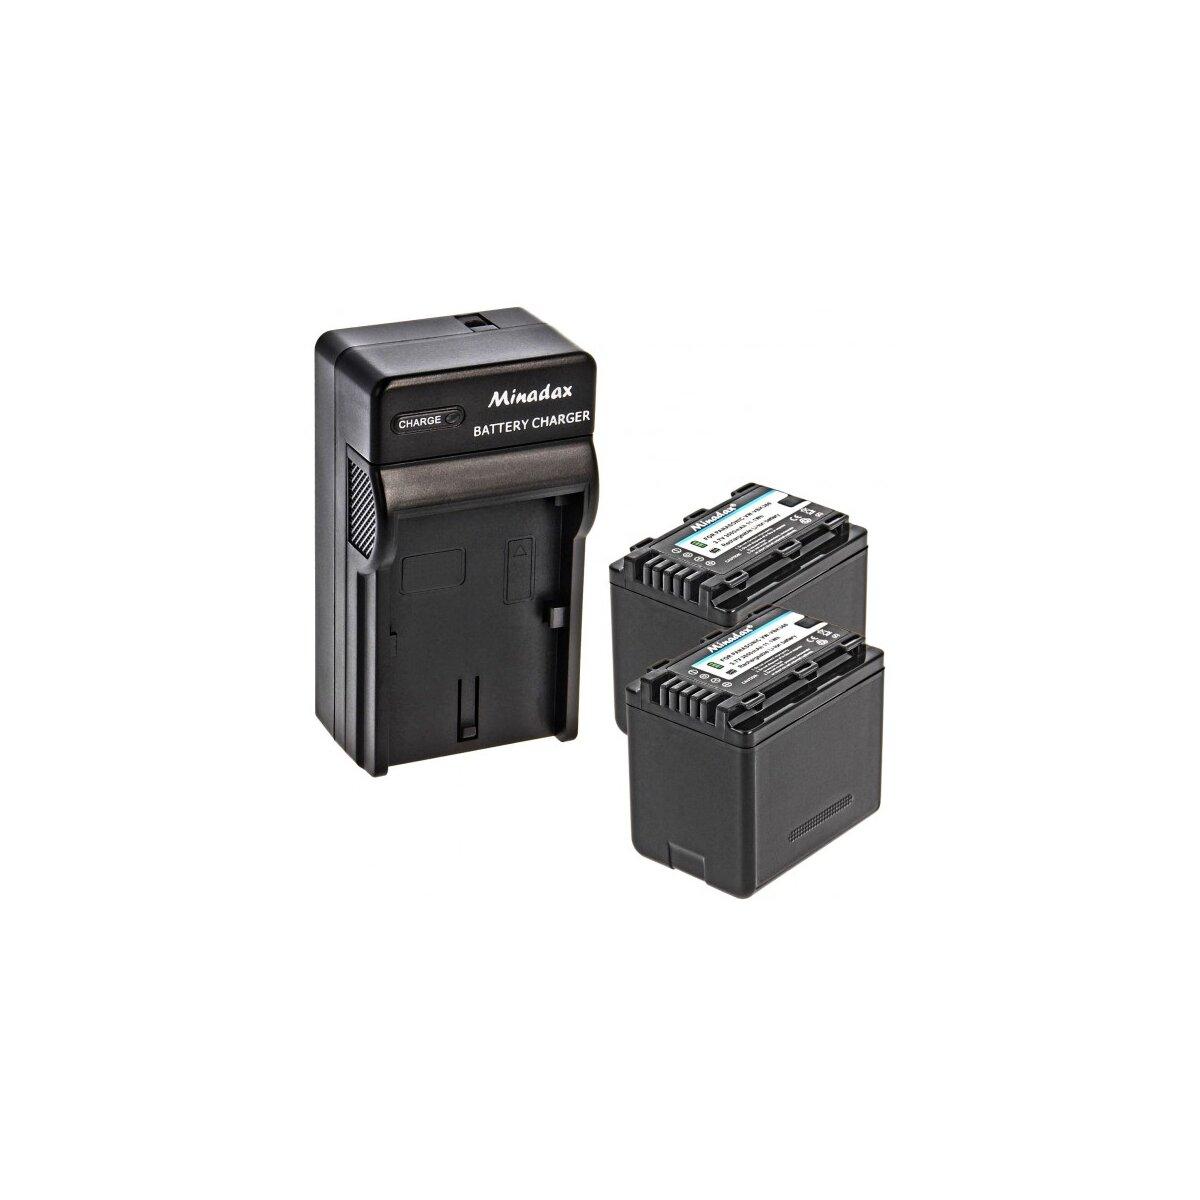 Minadax® Ladegeraet 100% kompatibel fuer Panasonic VW-VBK360 inkl. Auto Ladekabel, Ladeschale austauschbar + 2x Akku wie VW-VBK360